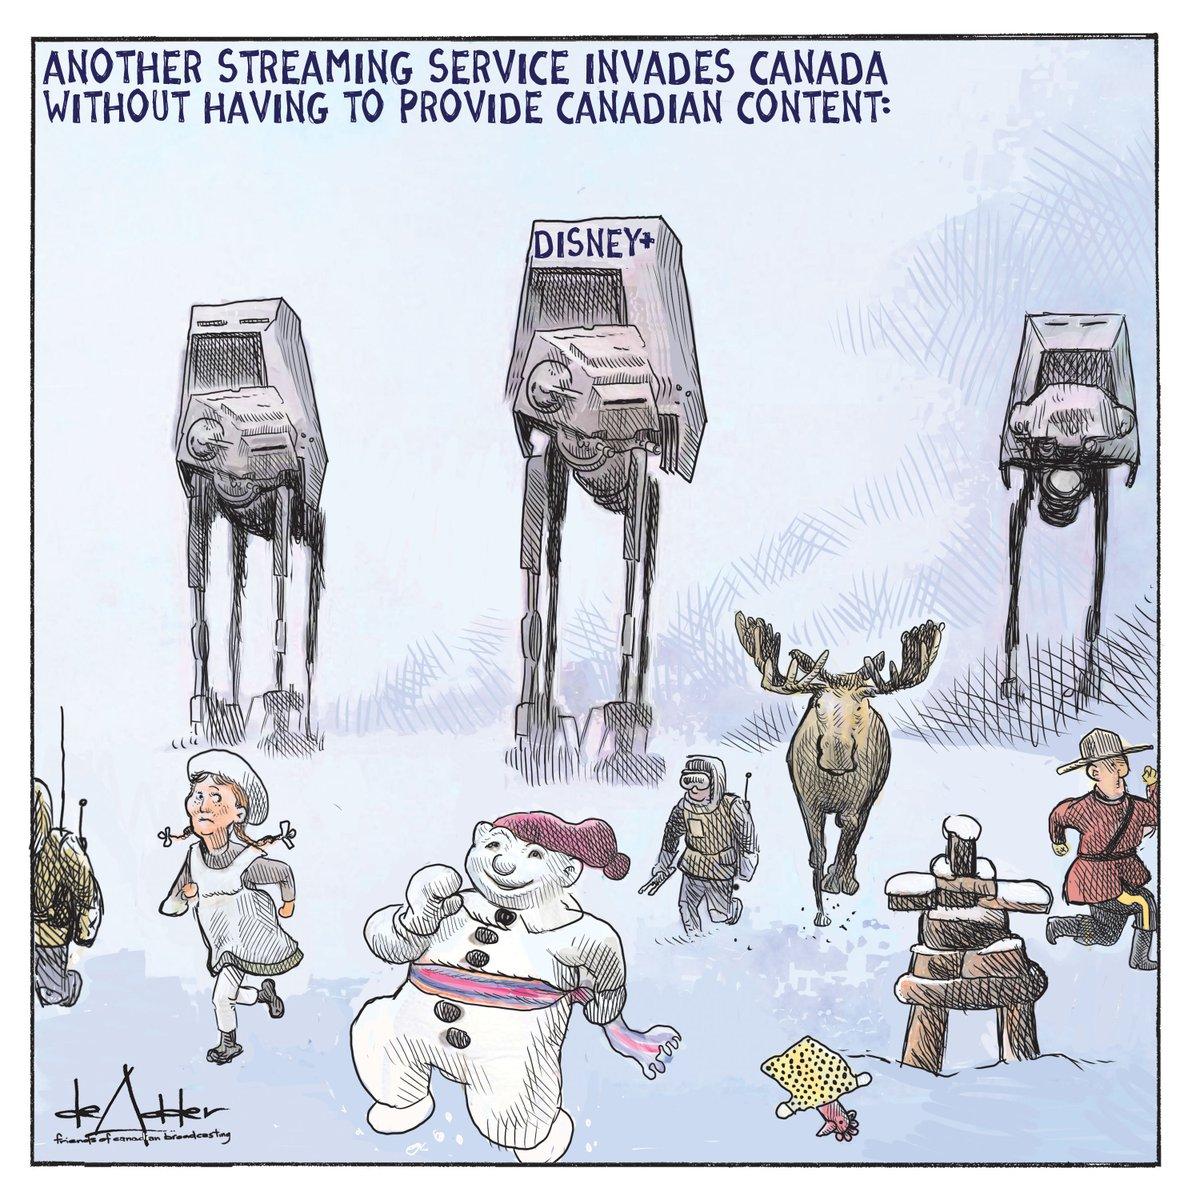 Replying to @friendscb: .@deAdder on #disneyplus in Canada.